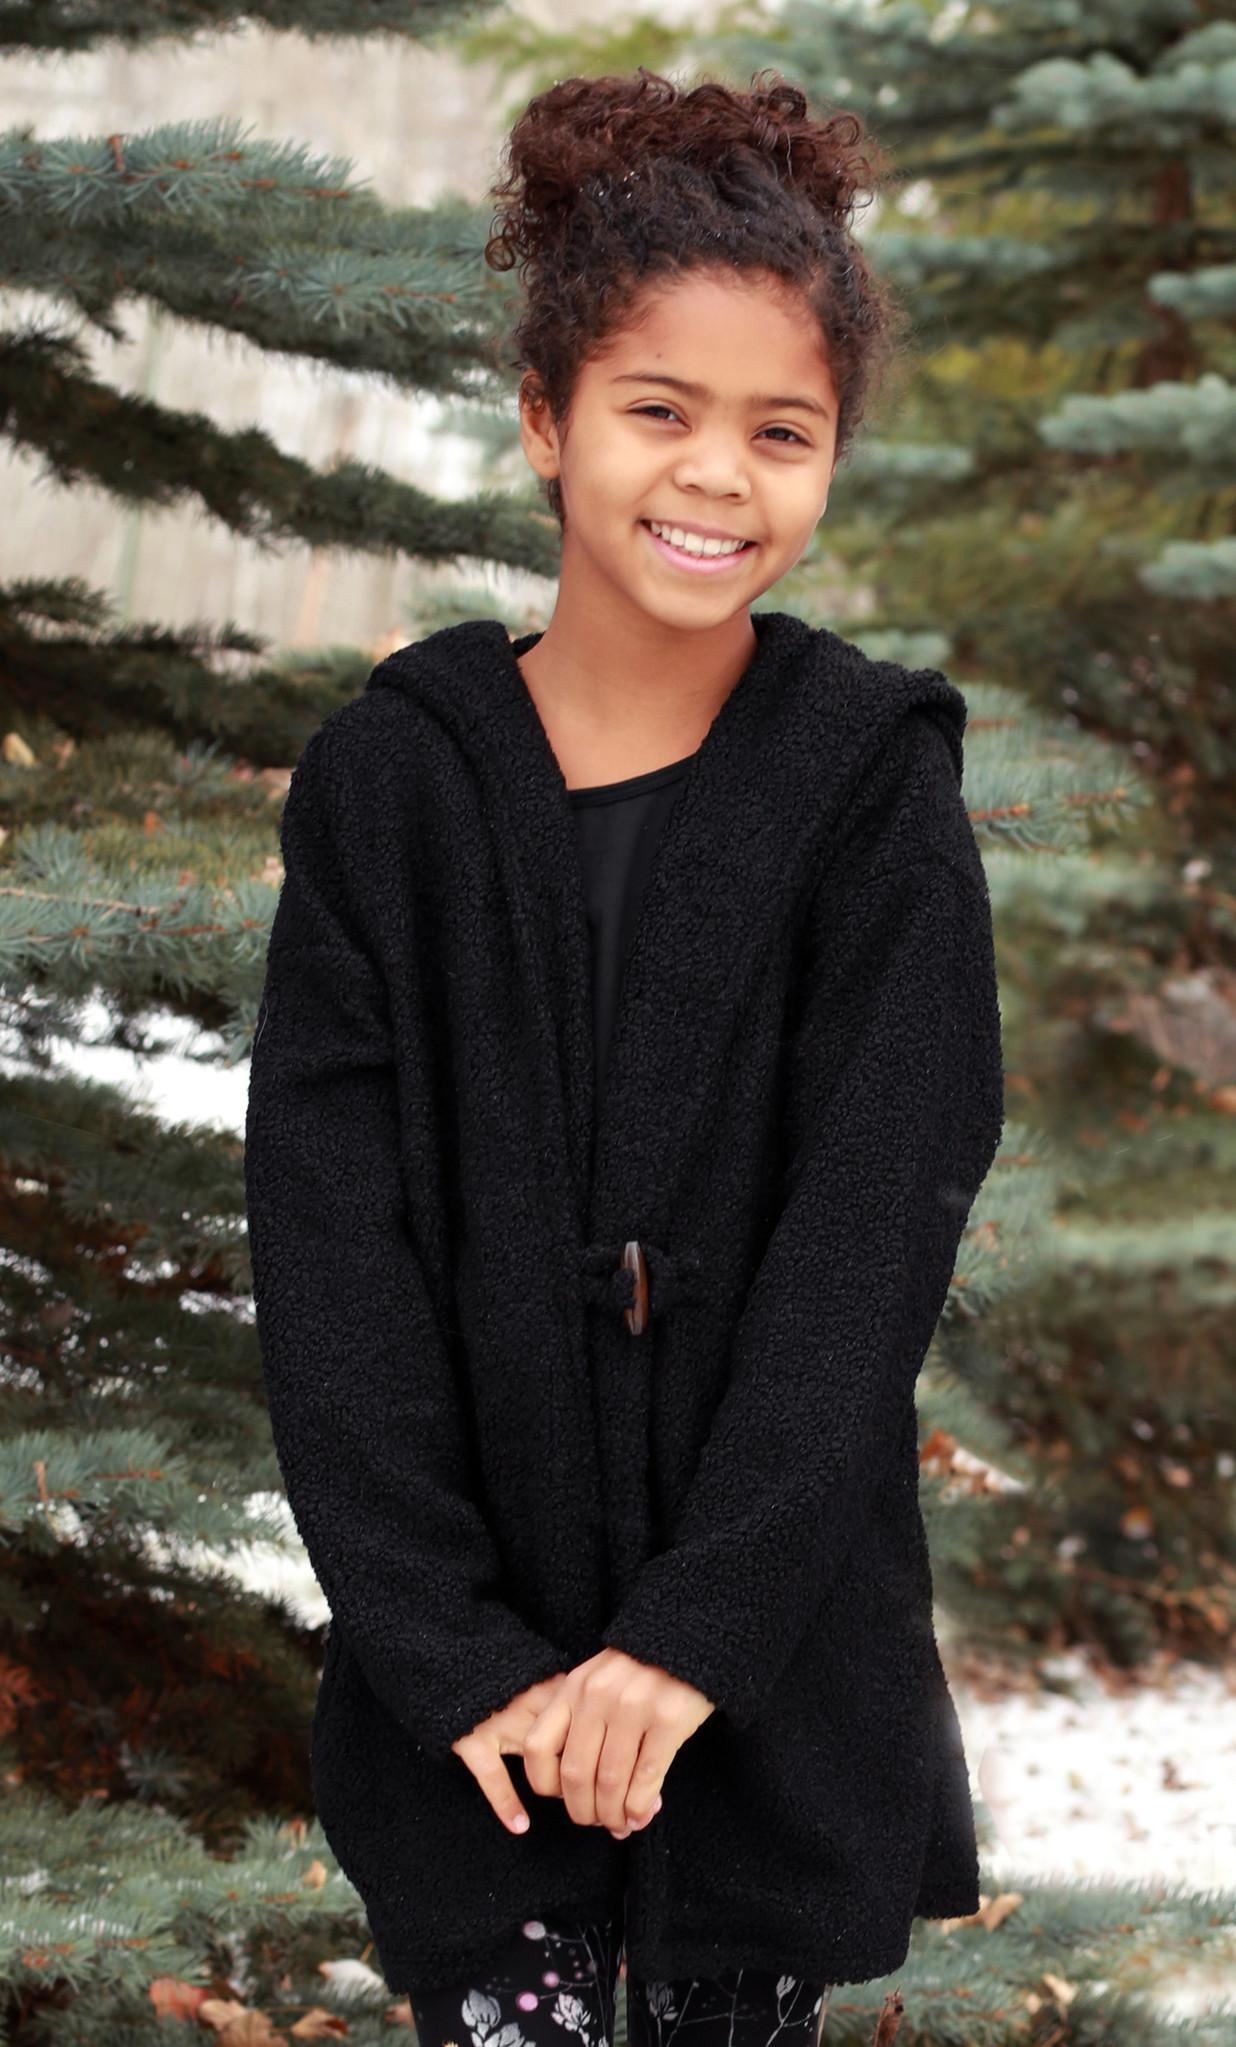 Gwen jr textured hooded cardigan